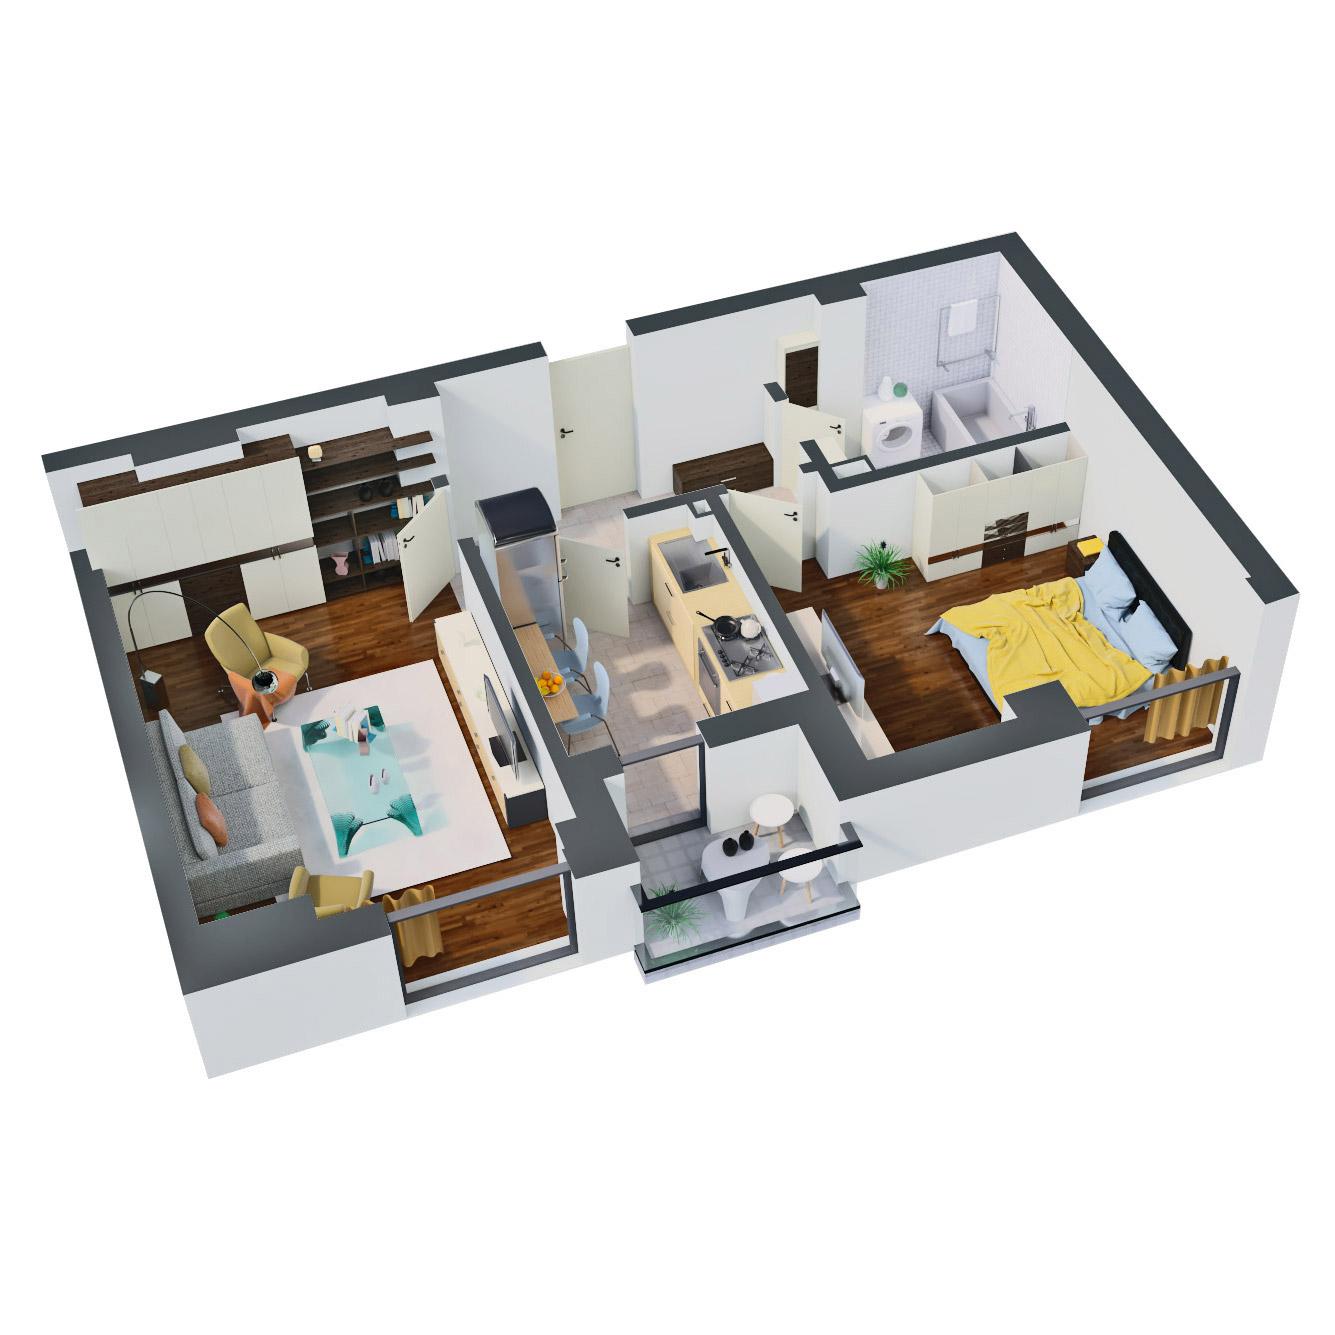 Apartament 2 camere de vanzare Bucuresti - Catedral Residence - Marriott, Piata Unirii, 13 Septembrie, Izvor - Tip 1 - T2A - B